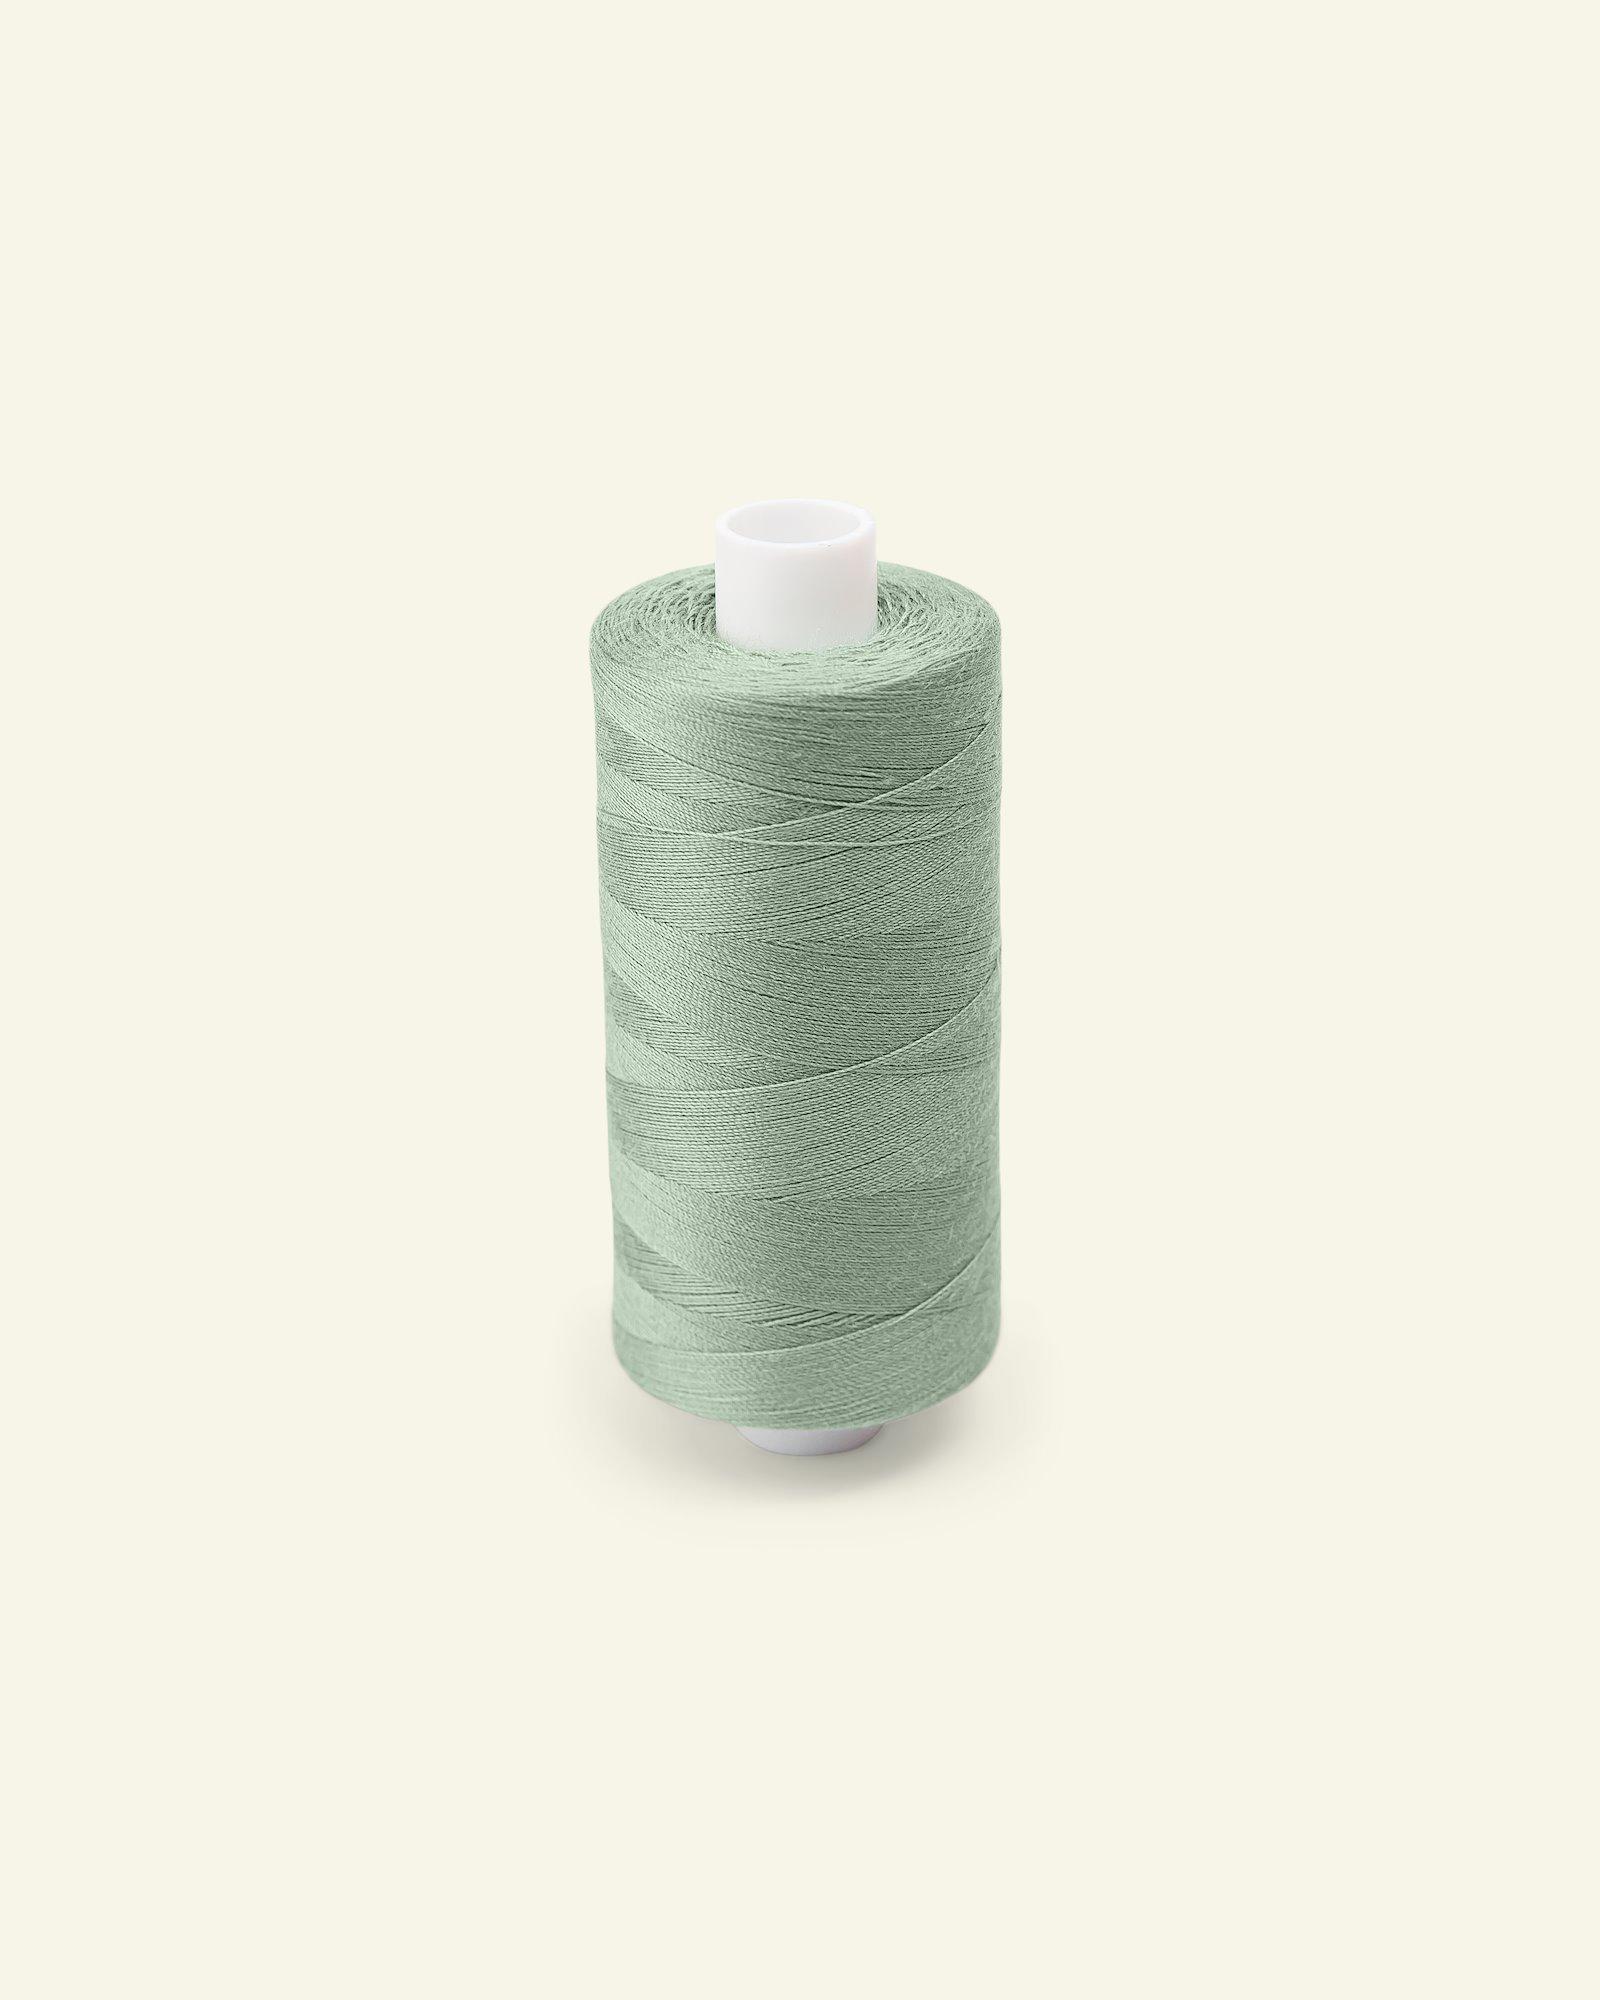 Sewing thread aqua/green 1000m